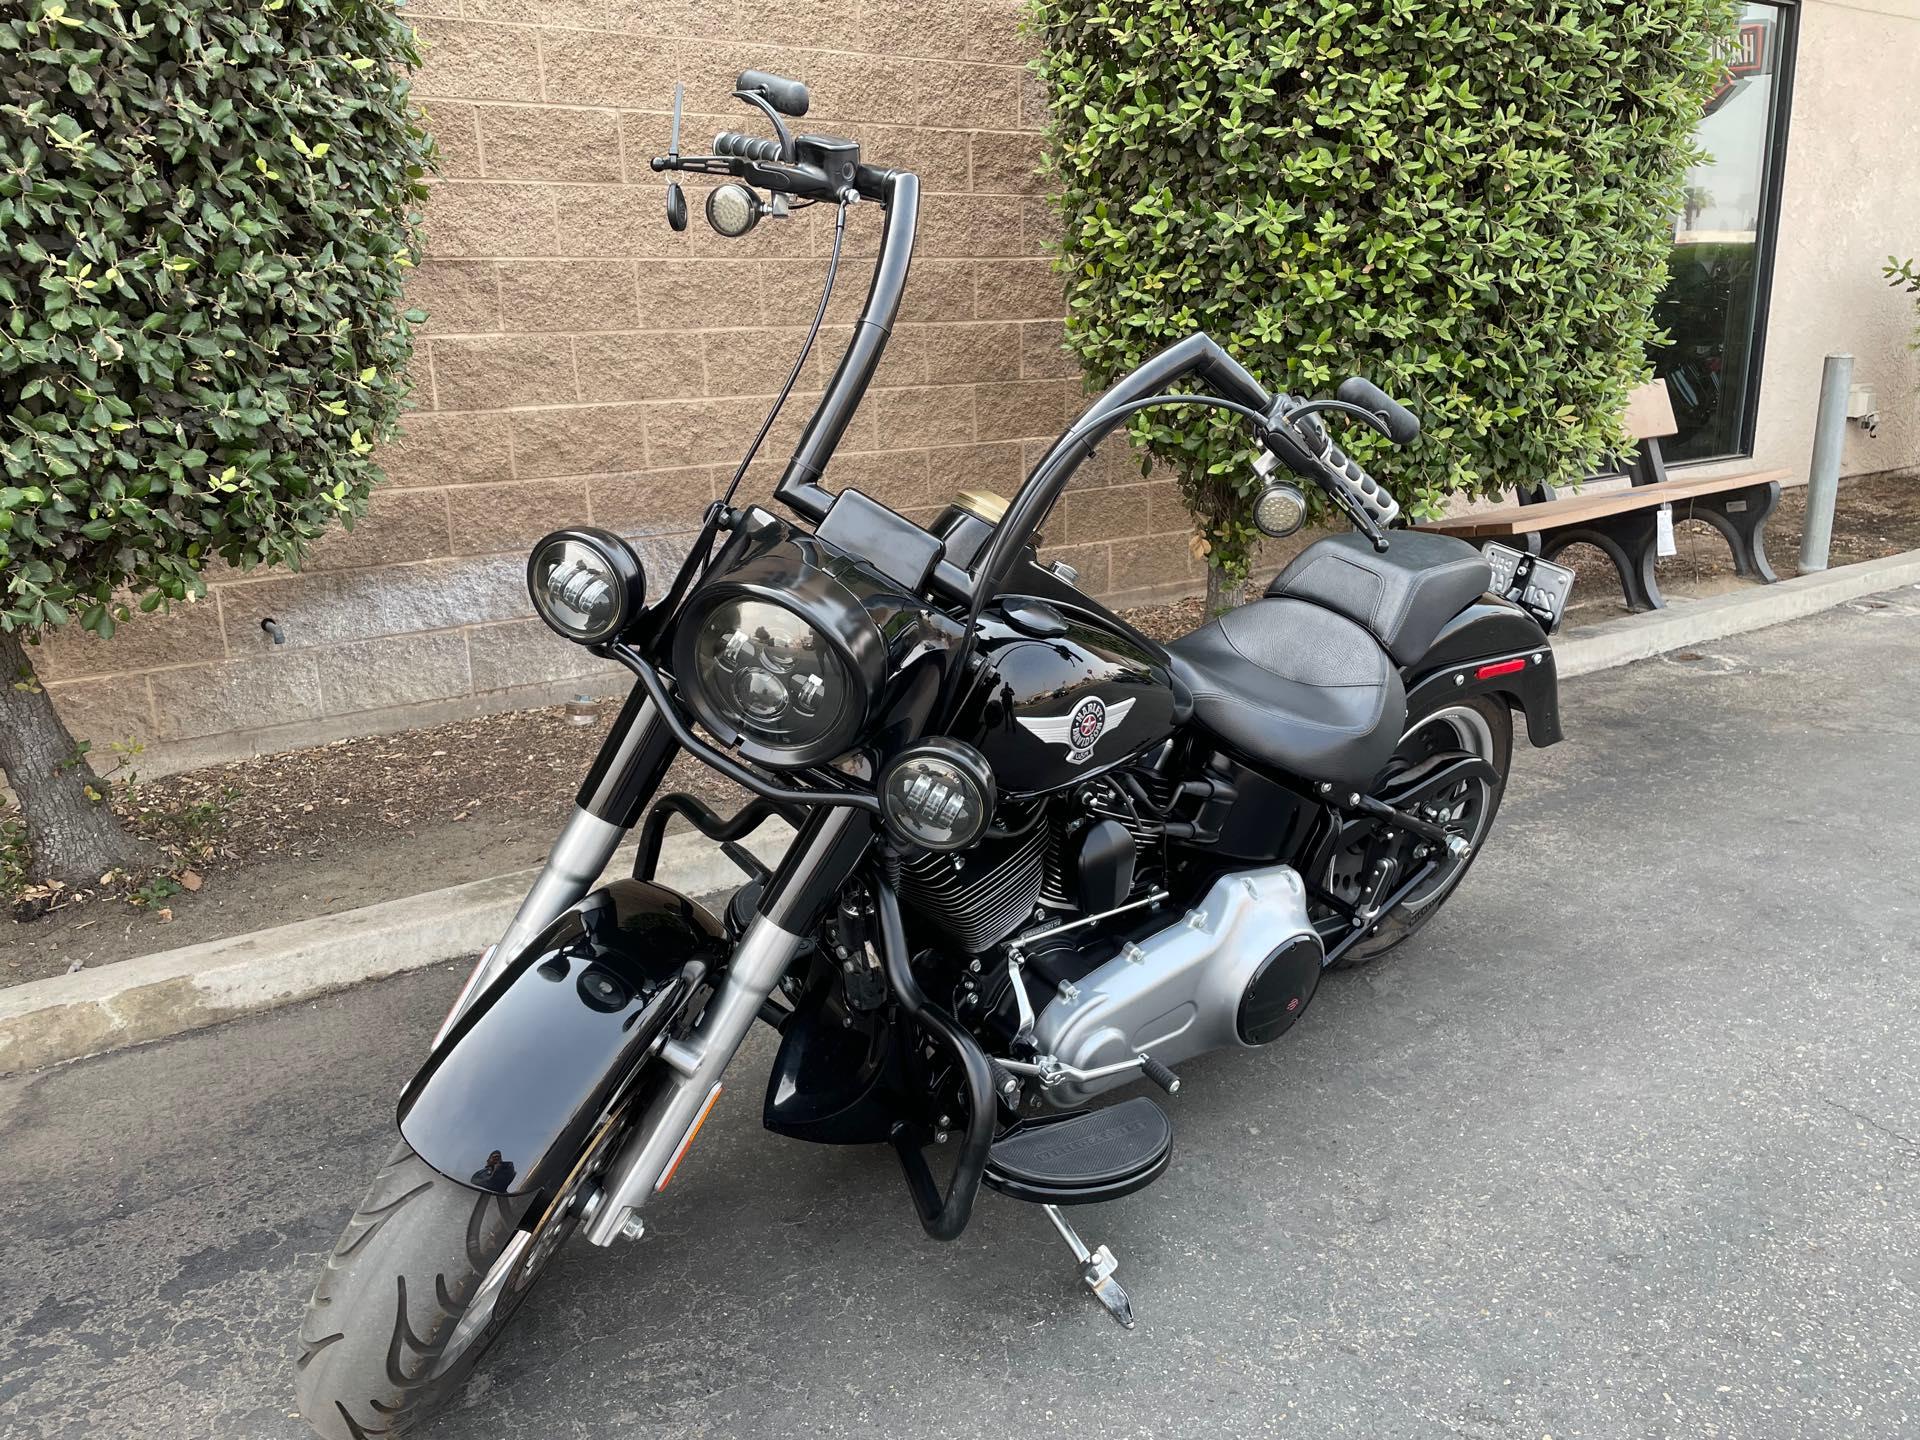 2016 Harley-Davidson Softail Fat Boy Lo at Fresno Harley-Davidson